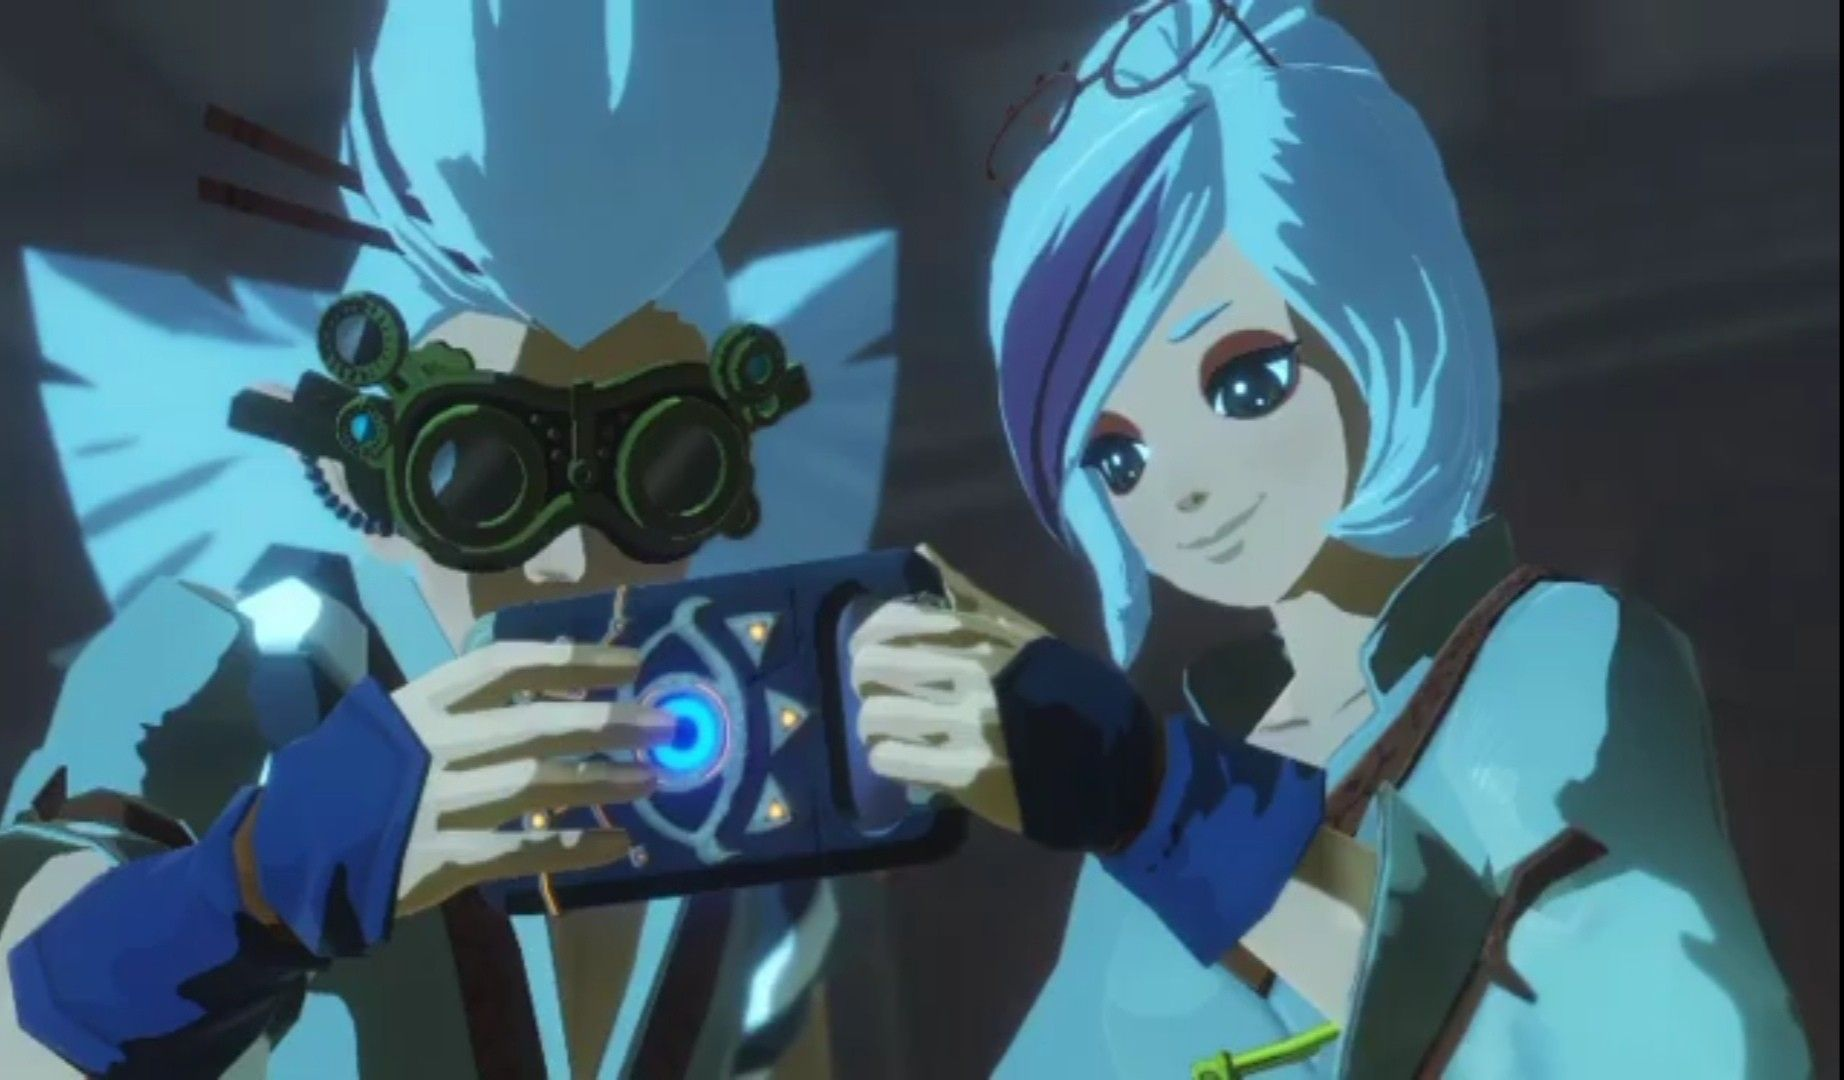 "Н'𝐎𝐁𝐁𝐈𝐄 Нð""𝐑𝐀𝐇 Age Of Calamity Hyrule Warriors Legend Of Zelda Zelda Hyrule Warriors"